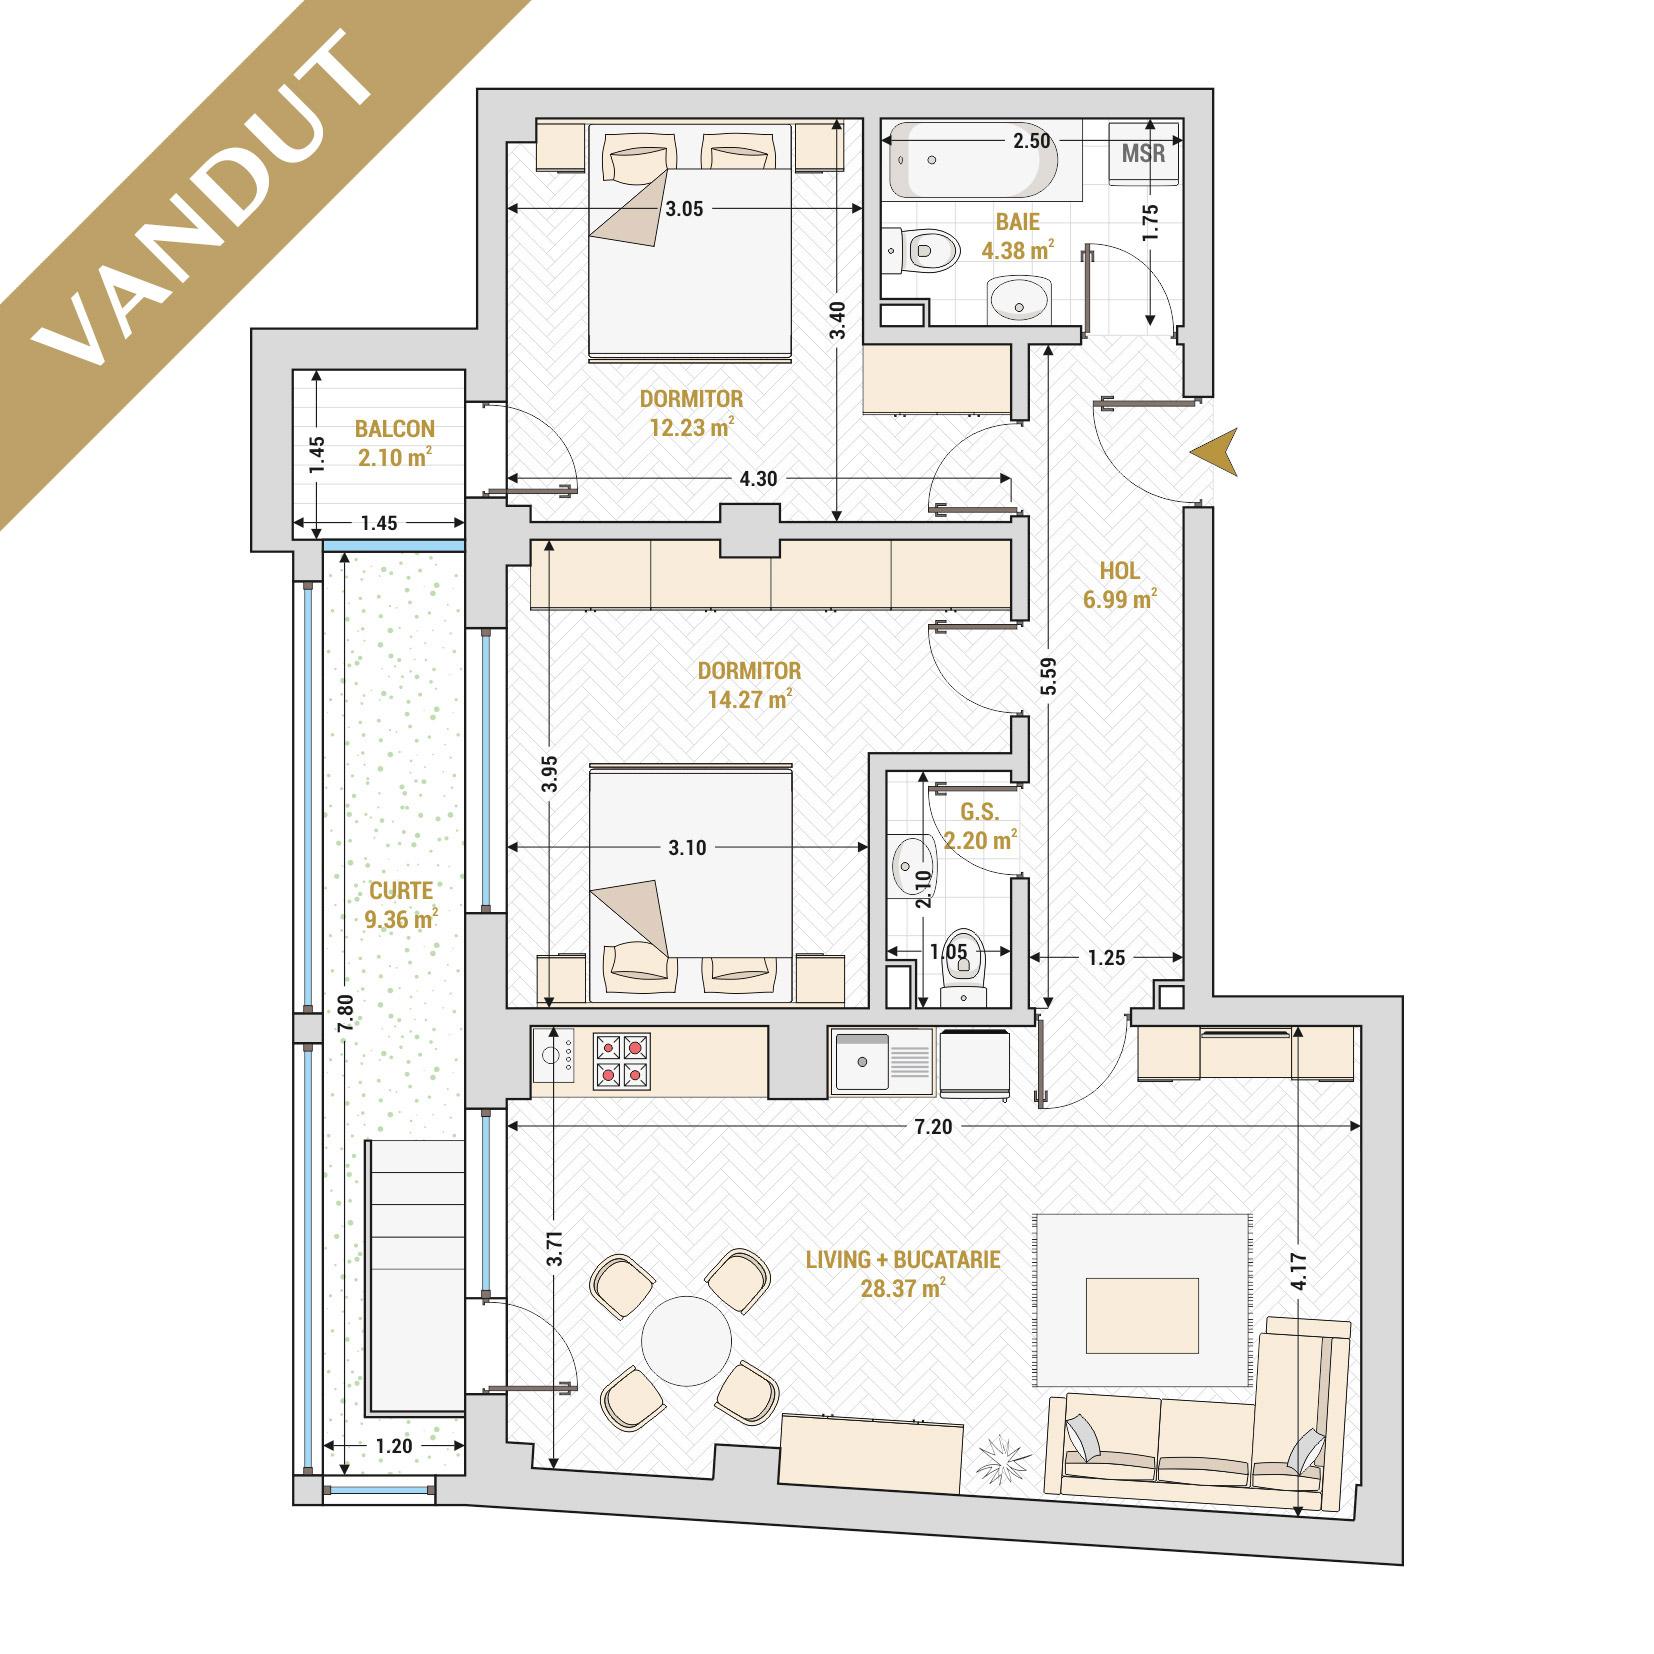 Apartament 3 camere de vanzare Bucuresti - Catedral Residence - Marriott, Piata Unirii, 13 Septembrie, Izvor - Tip 3 - T2A - VANDUT